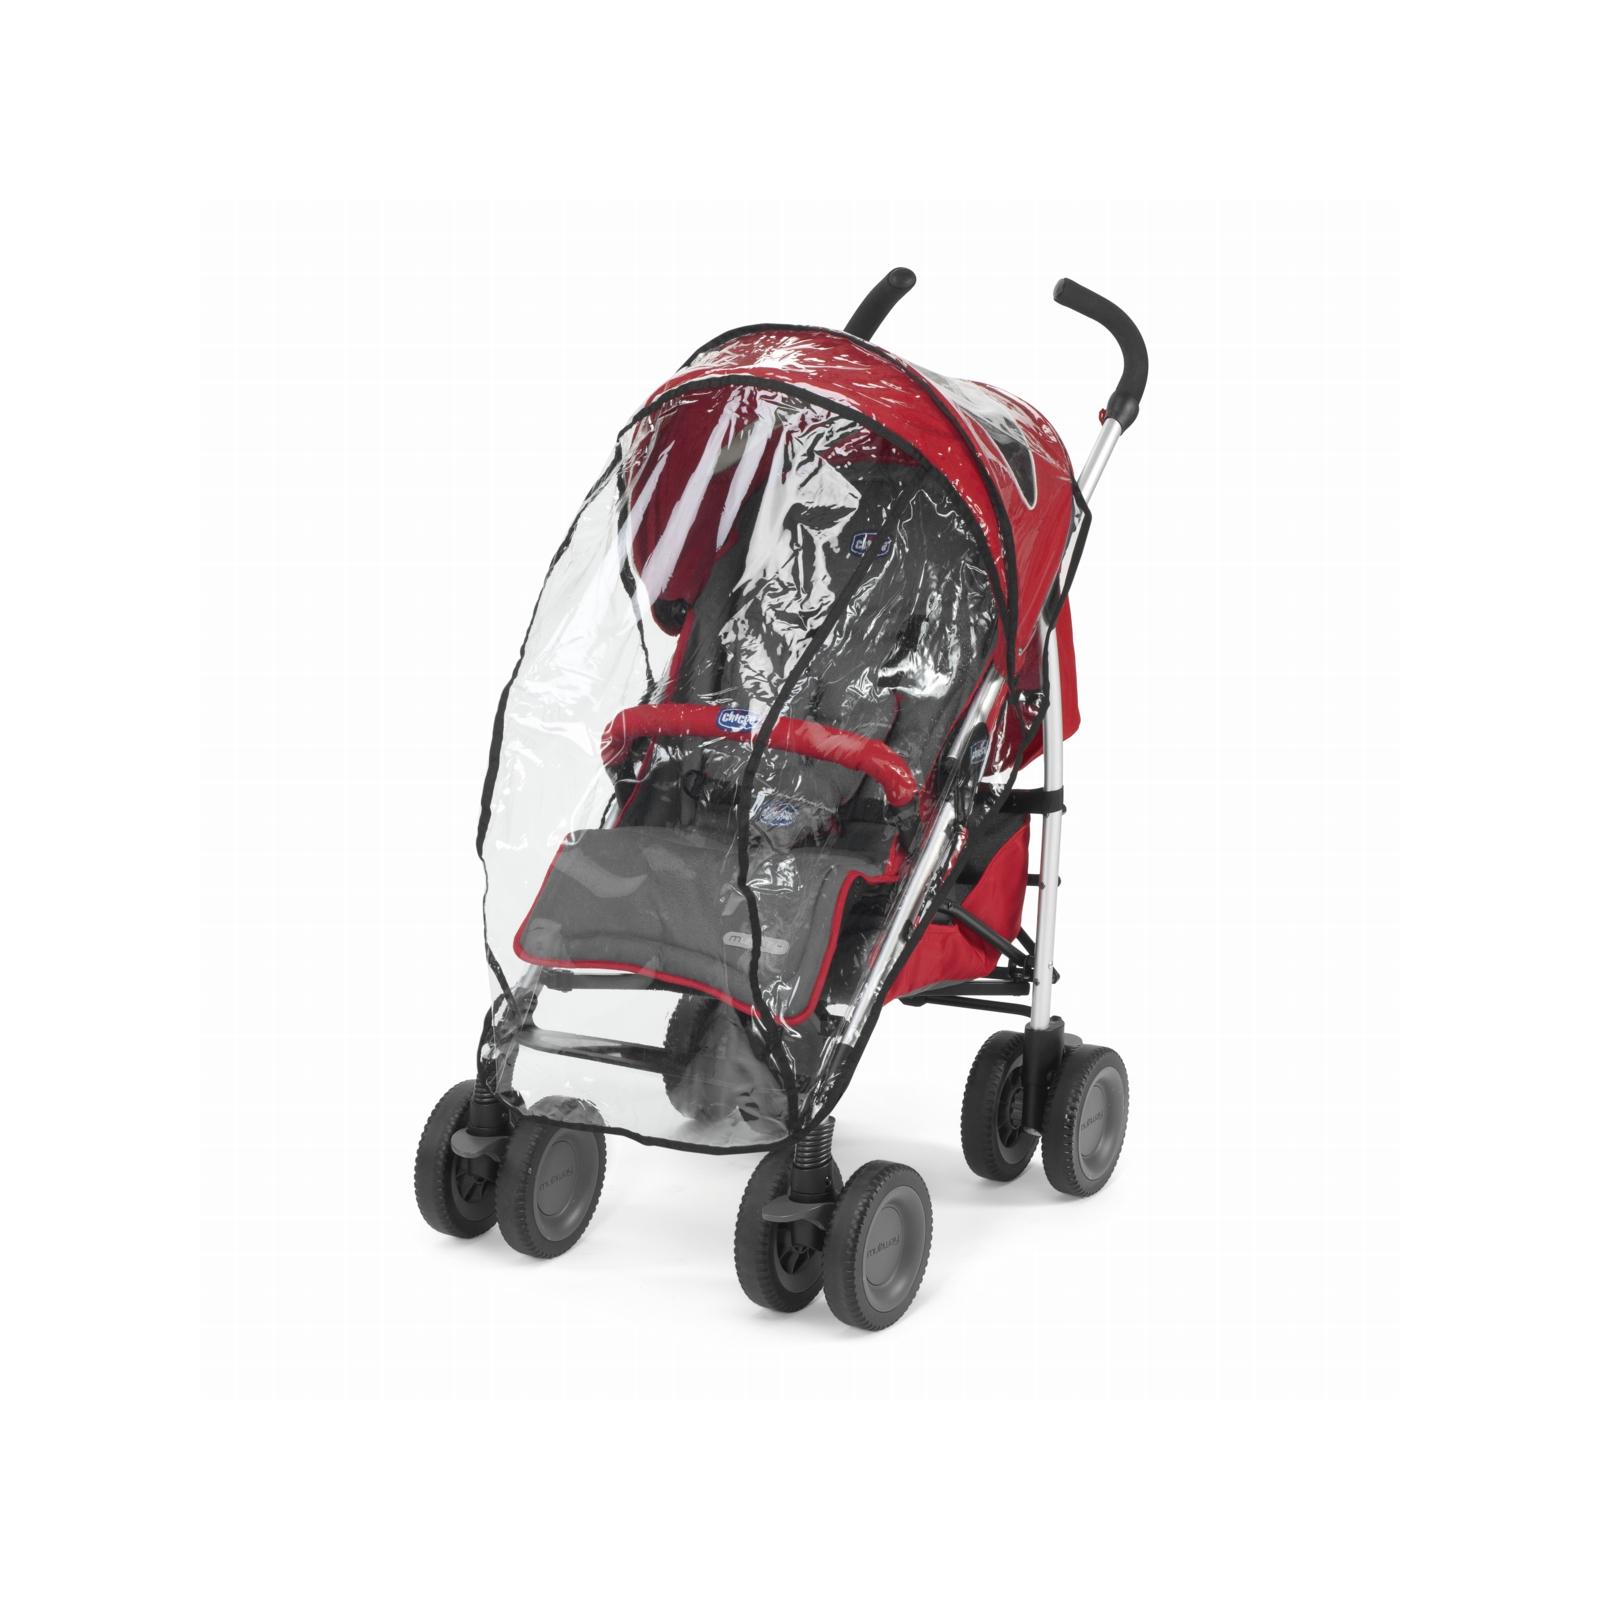 Коляска Chicco Multiway Evo Stroller Red (79315.70) изображение 6